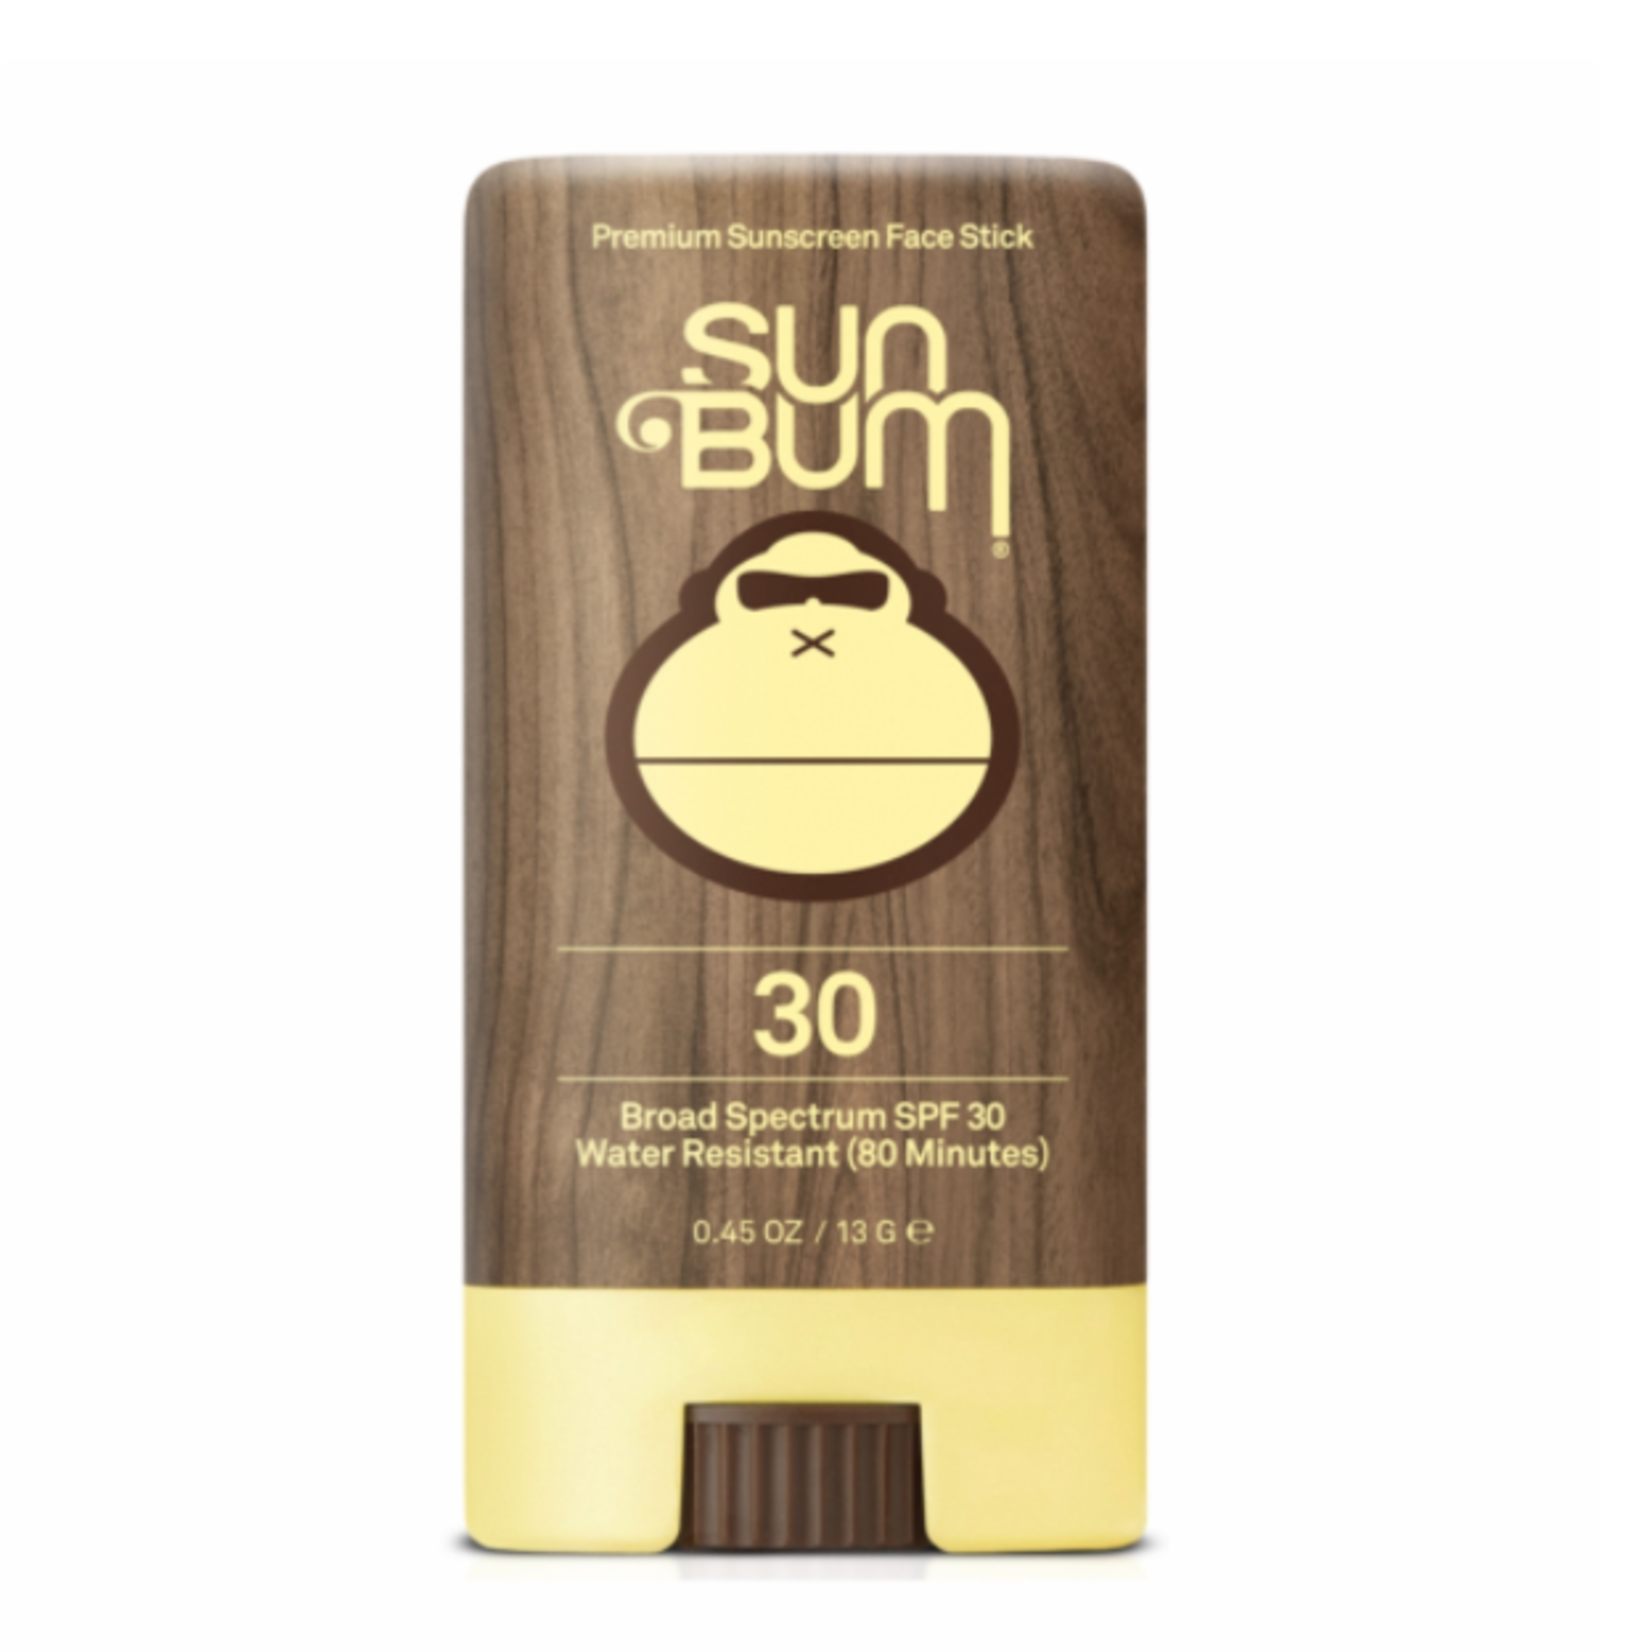 Sun Bum Sun Bum Original SPF 30 Sunscreen Face Stick